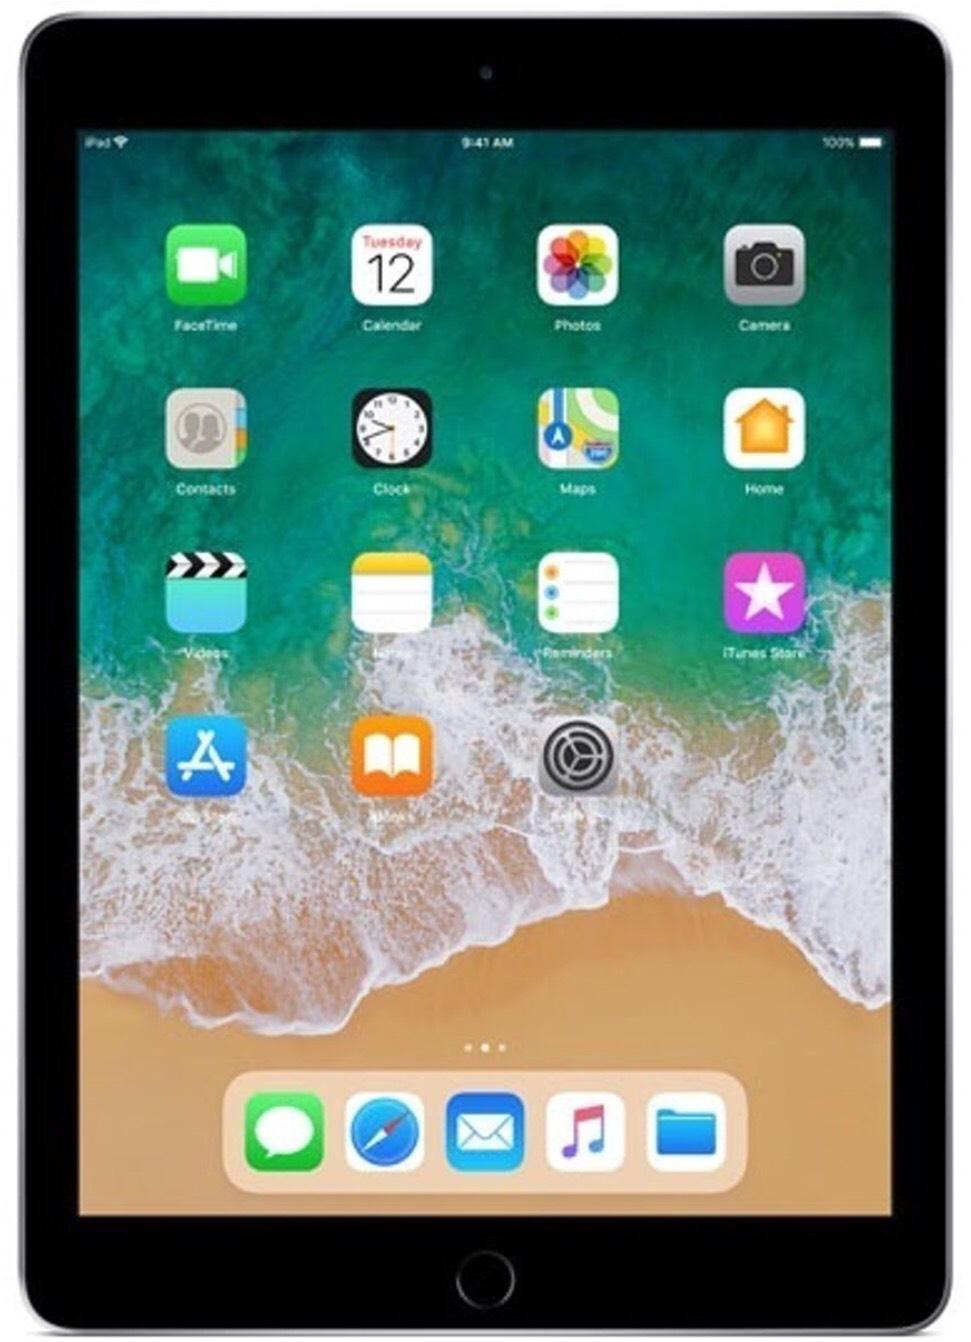 (Dagdeal) Korting op tablets van o.a Samsung en Apple @Bol.com